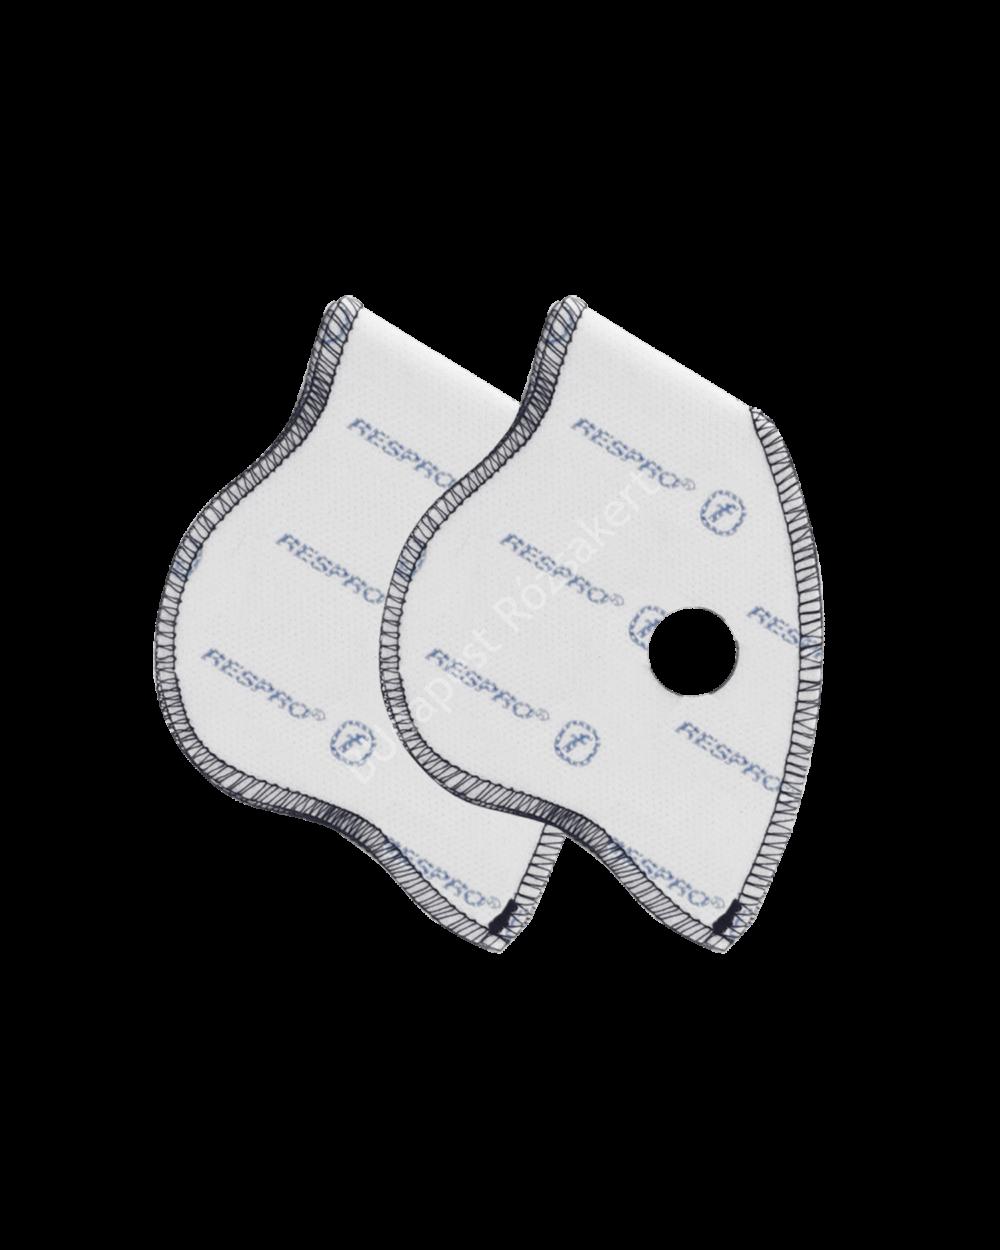 Filter pack RESPRO TECHNO XL